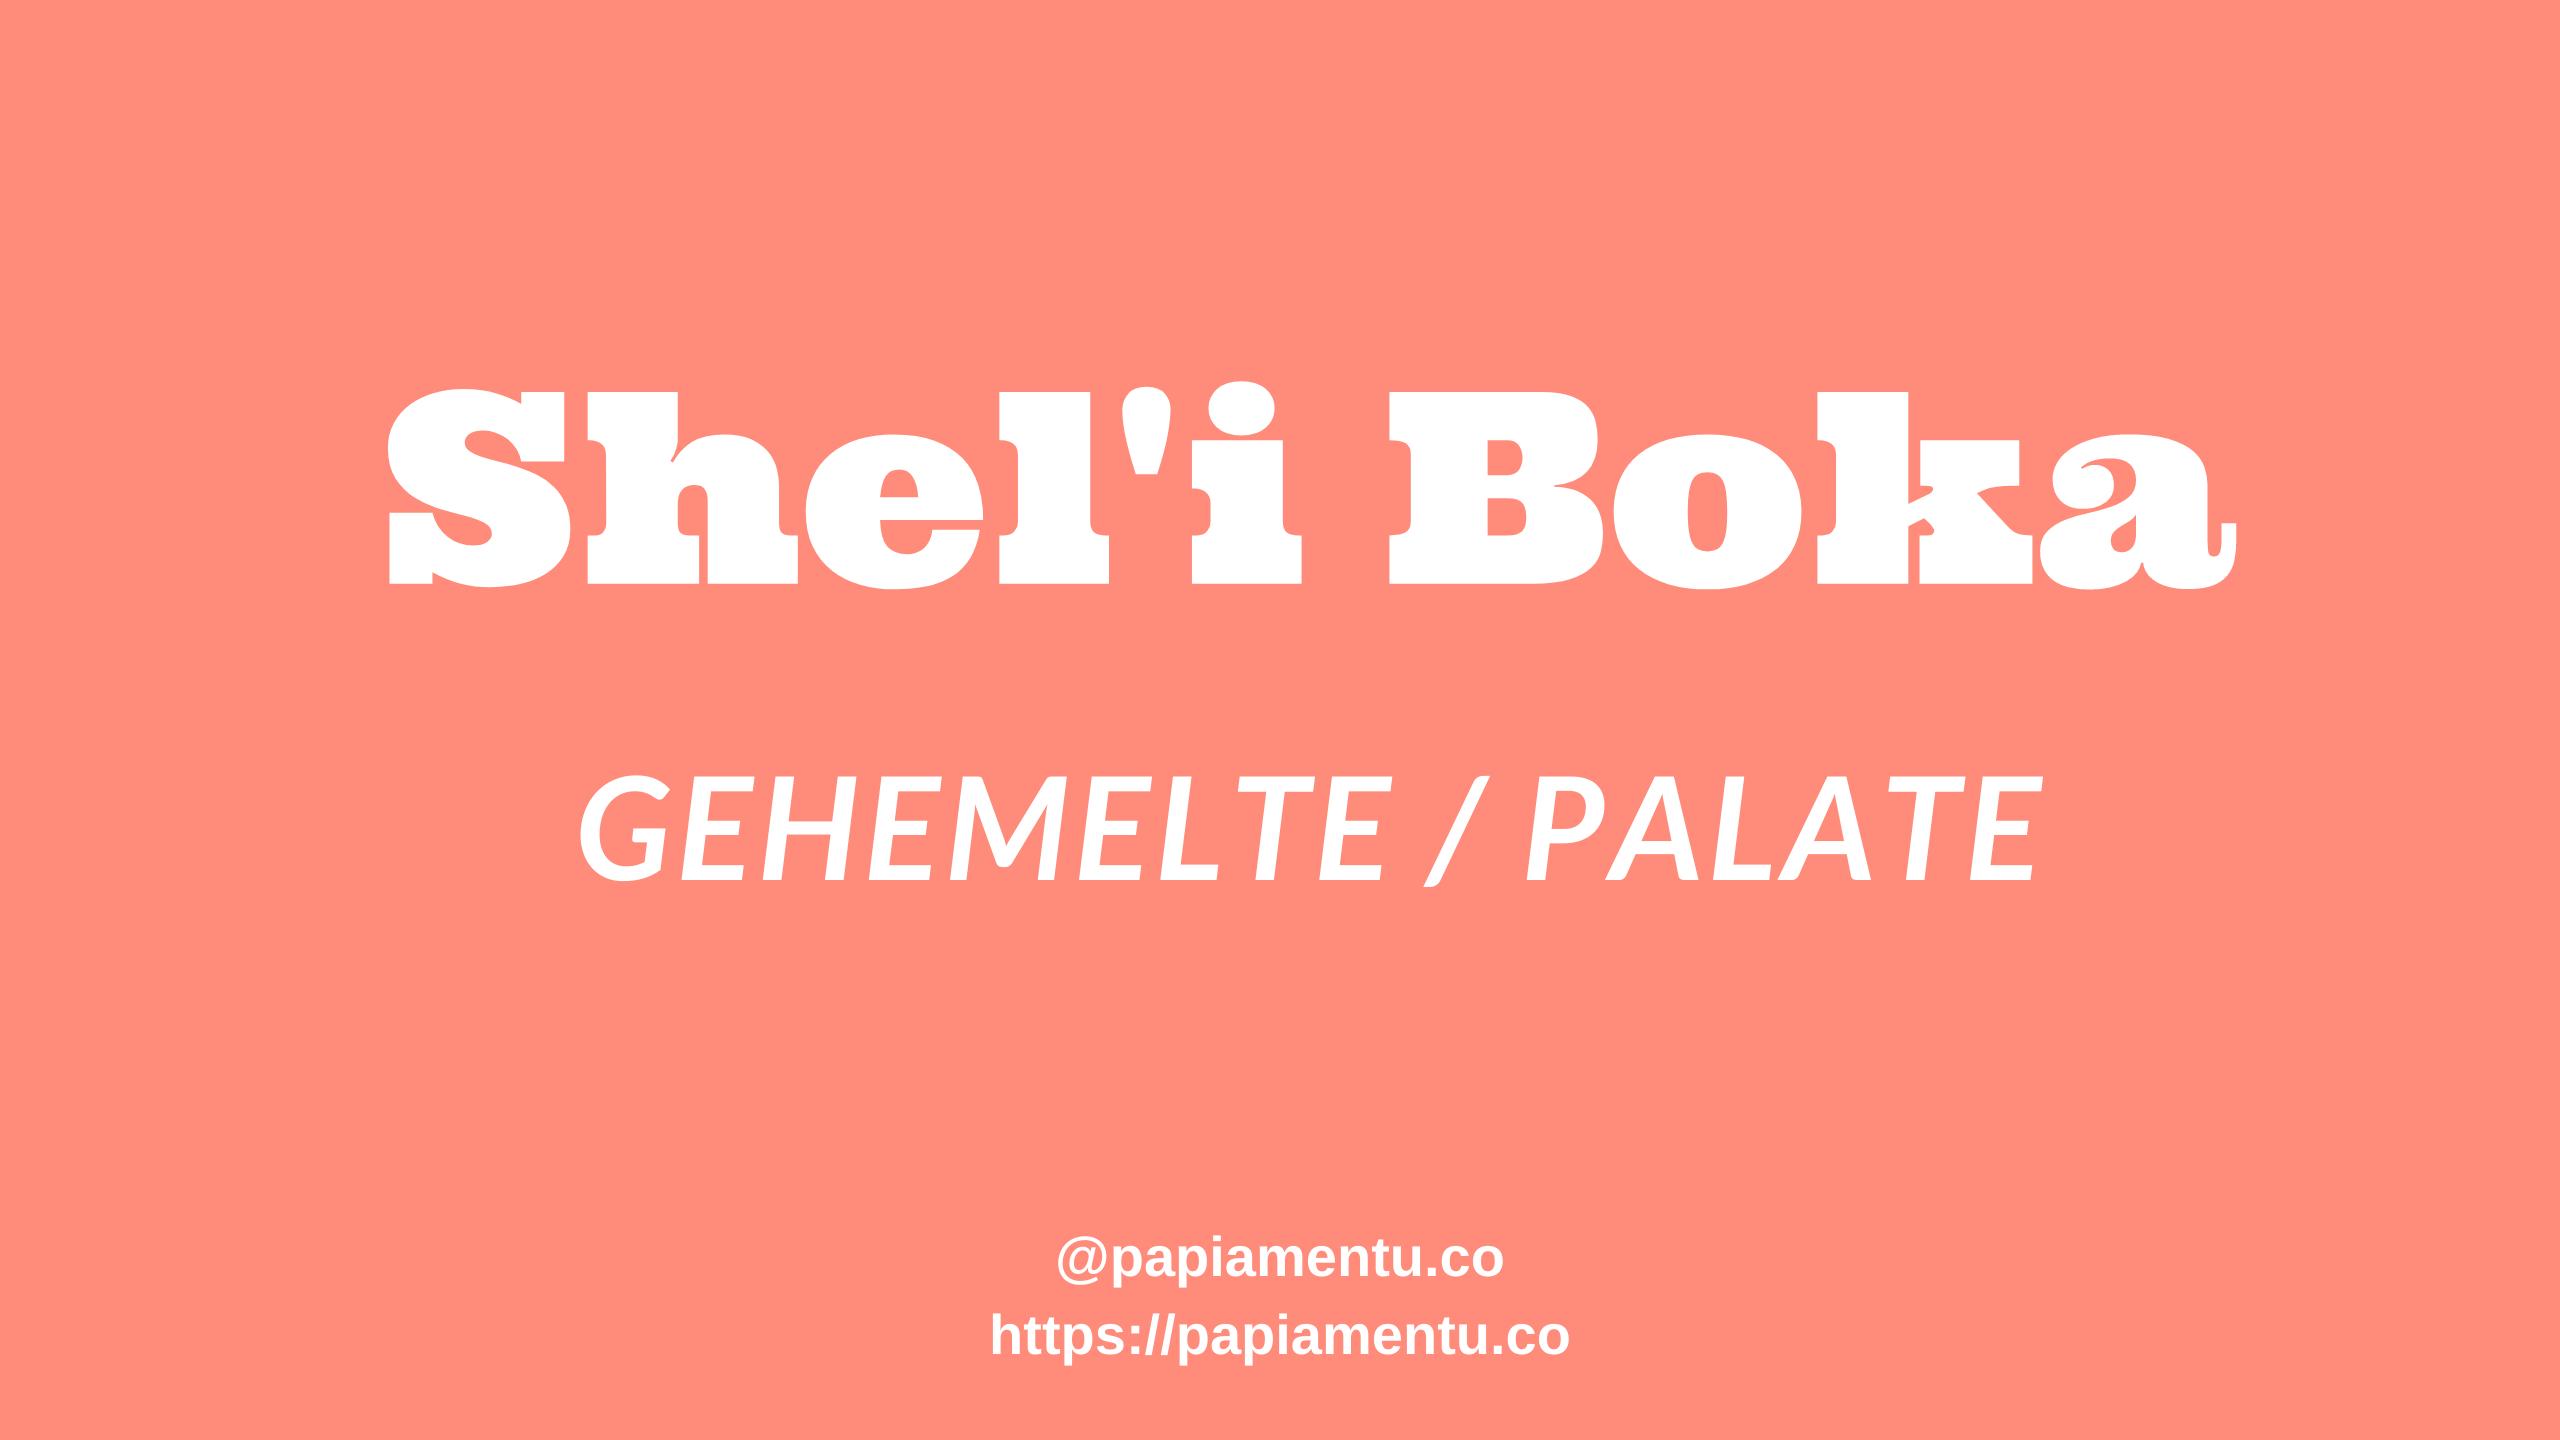 Shel'i Boka / Gehemelte / Palate in Papiamento